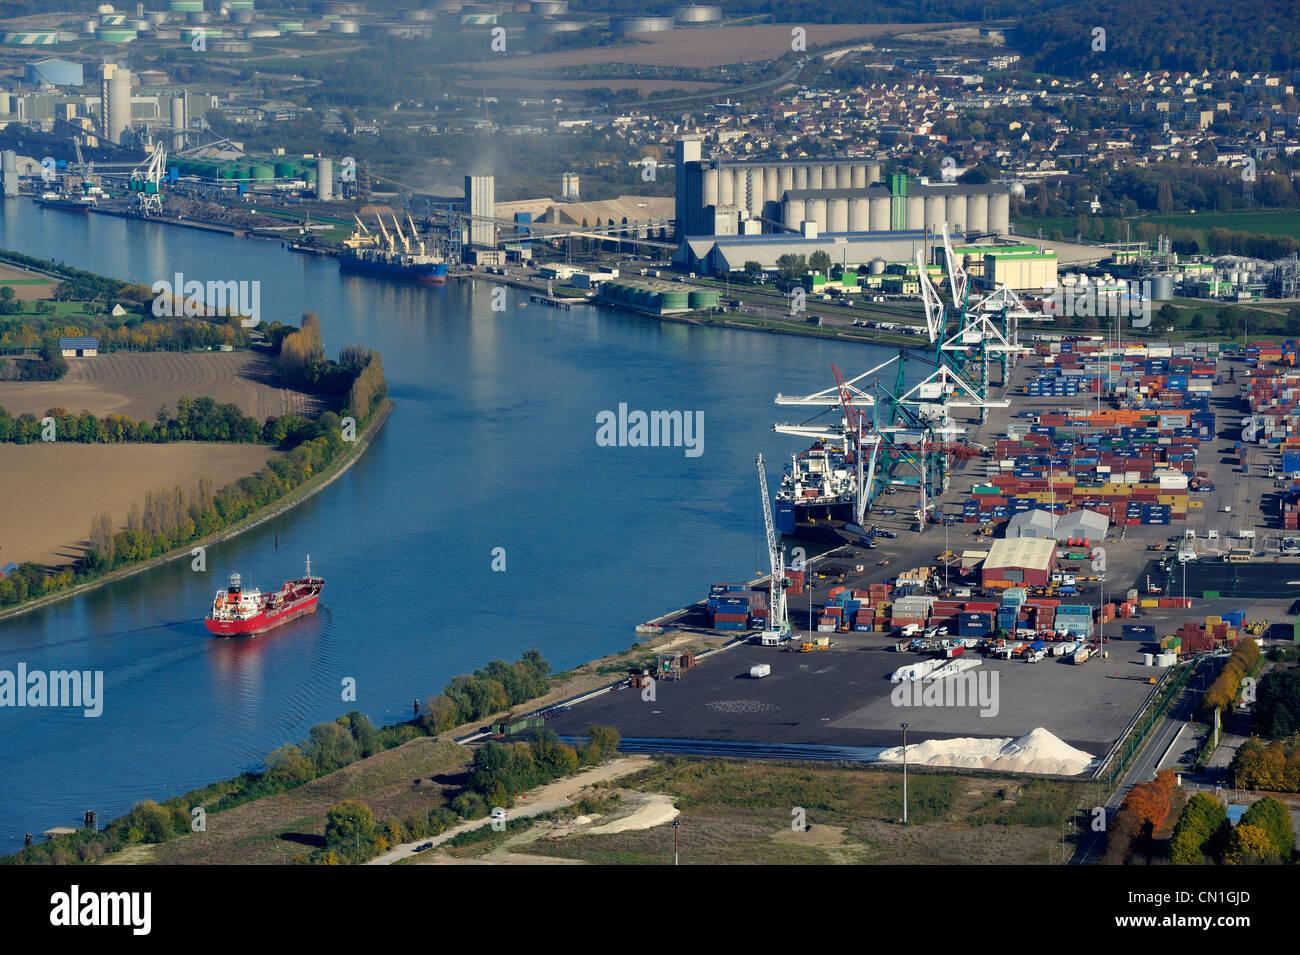 France seine maritime the grand port maritime de rouen port of stock photo royalty free - Grand port maritime de rouen ...